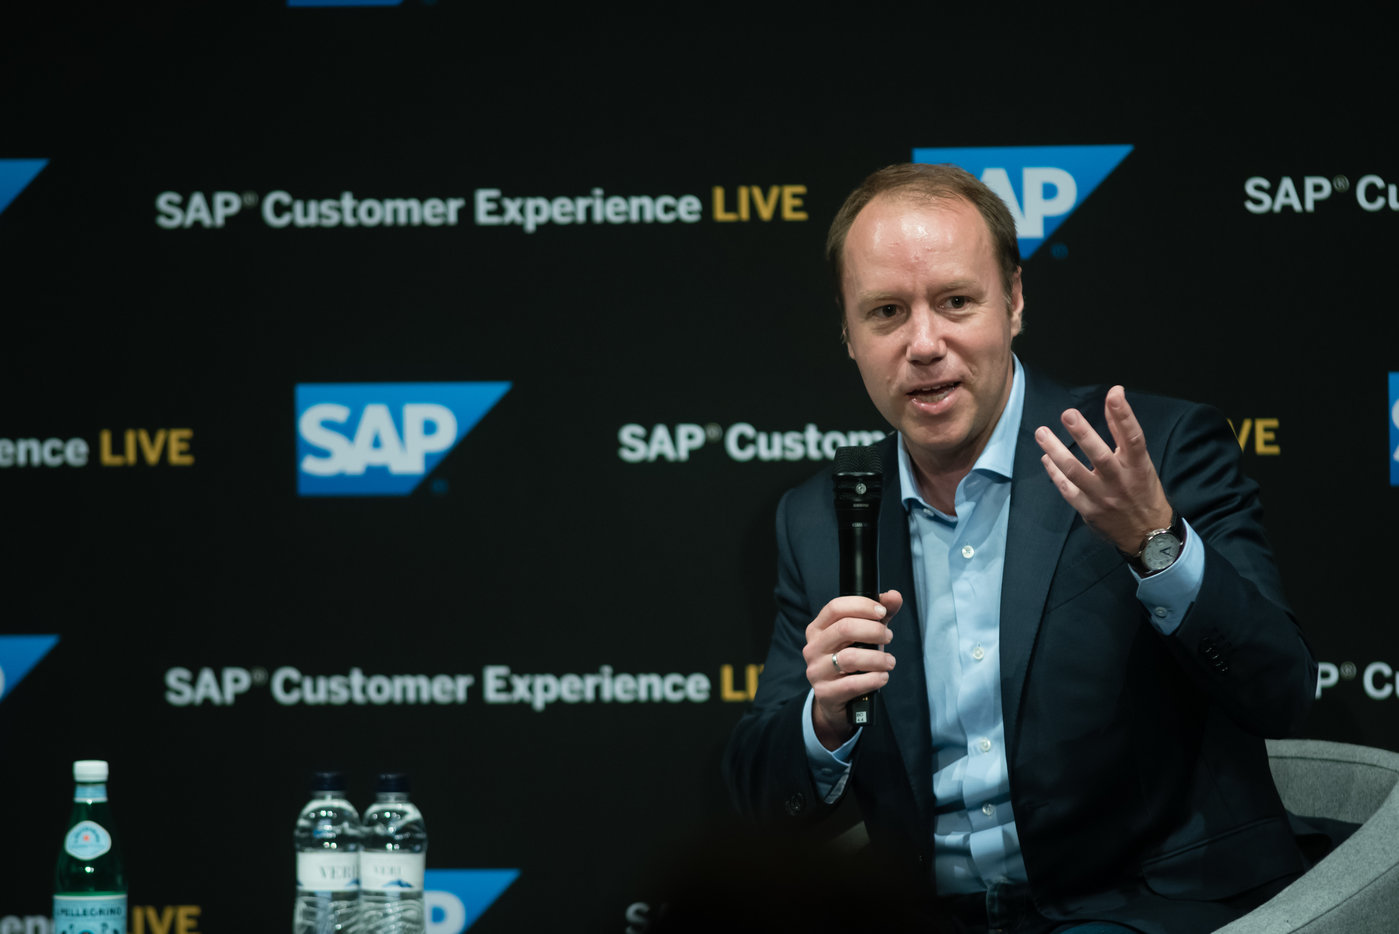 SAP安睿山接受媒体采访